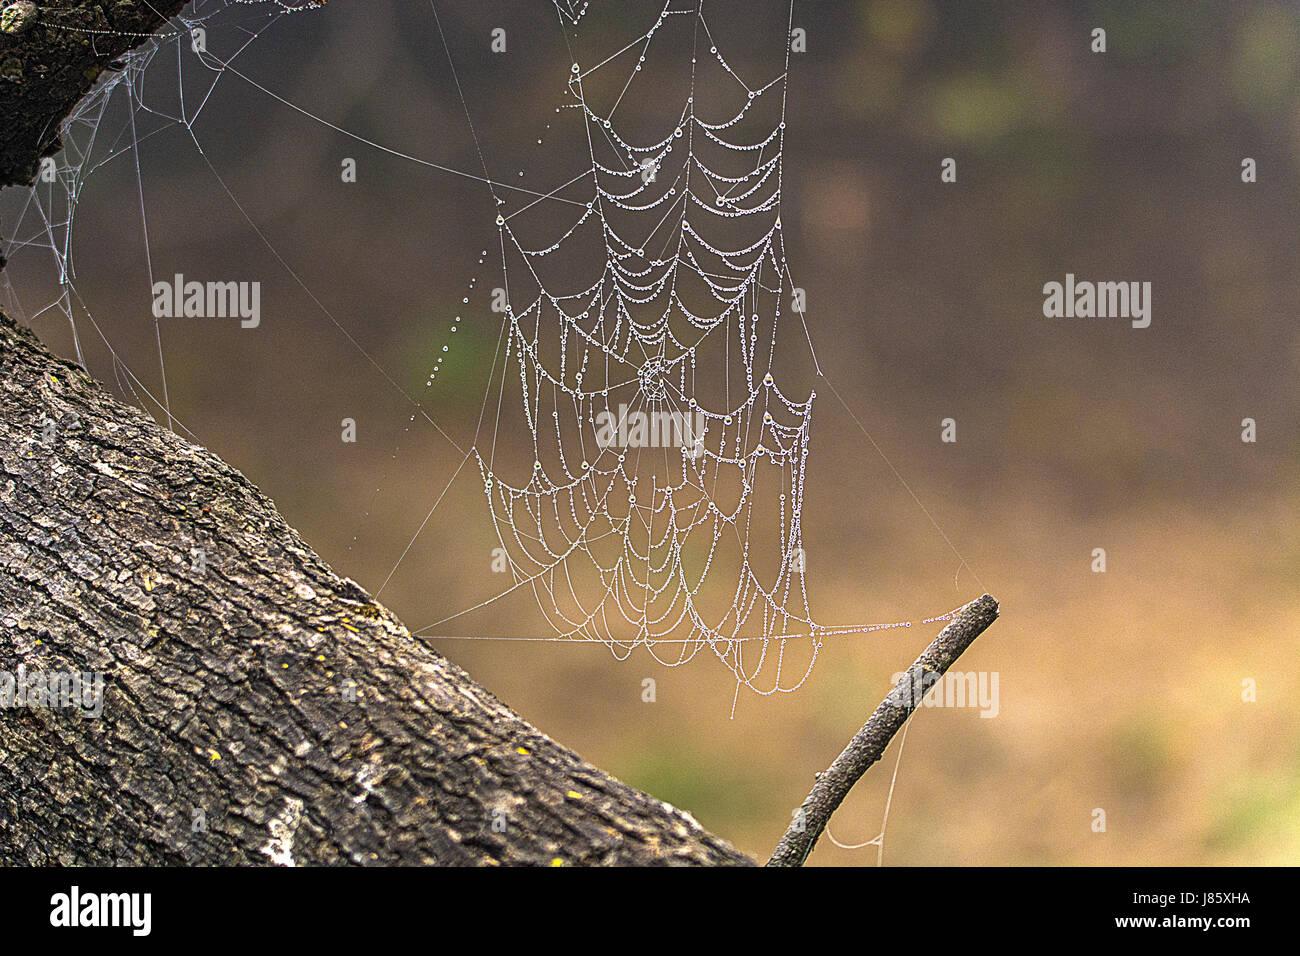 Spider Web - Stock Image